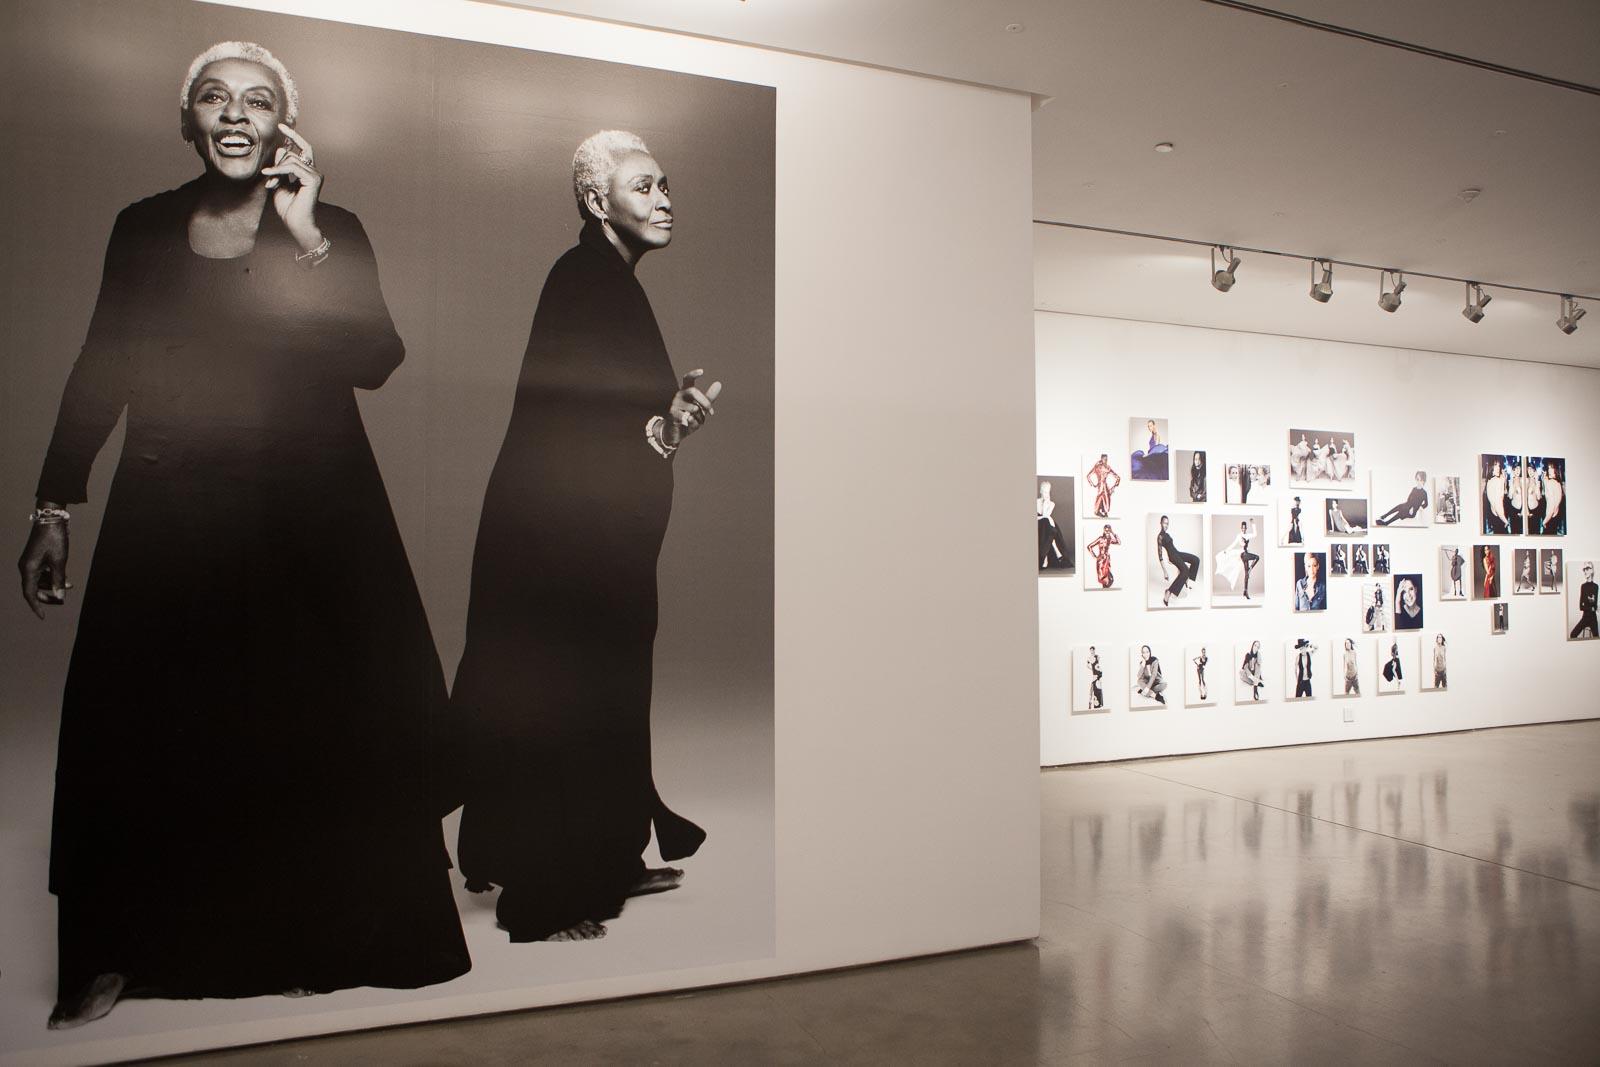 alexi-lubomirski-diverse-beauty-exhibition-robertiaga-9